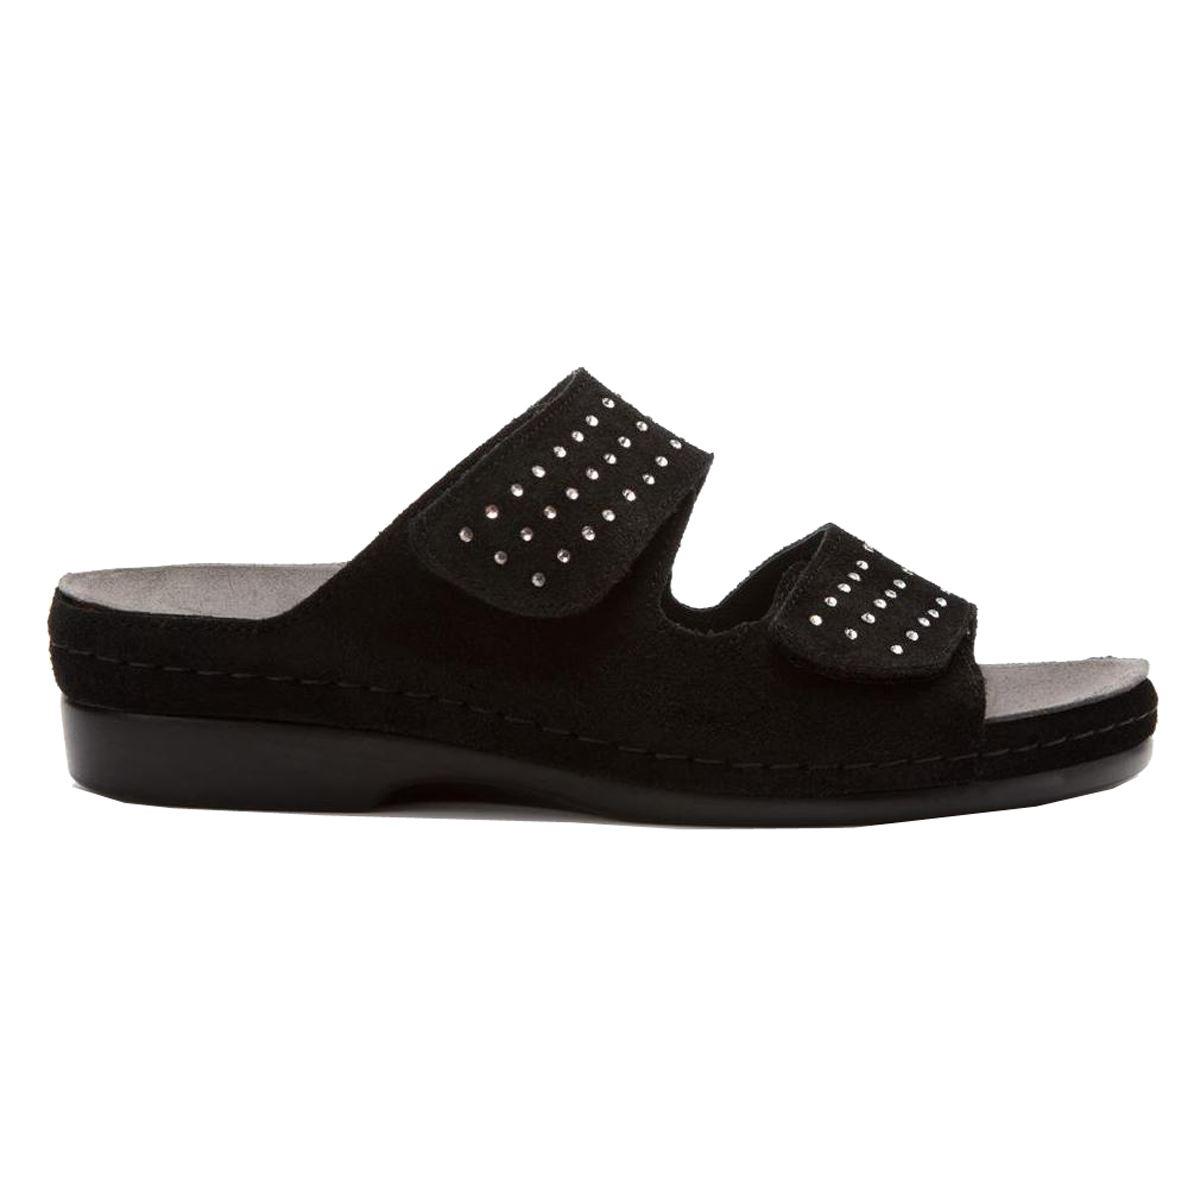 high larger combo p sandal image good silver slide in comforter shoes quality heeled sale helle highheeled women ece comfort